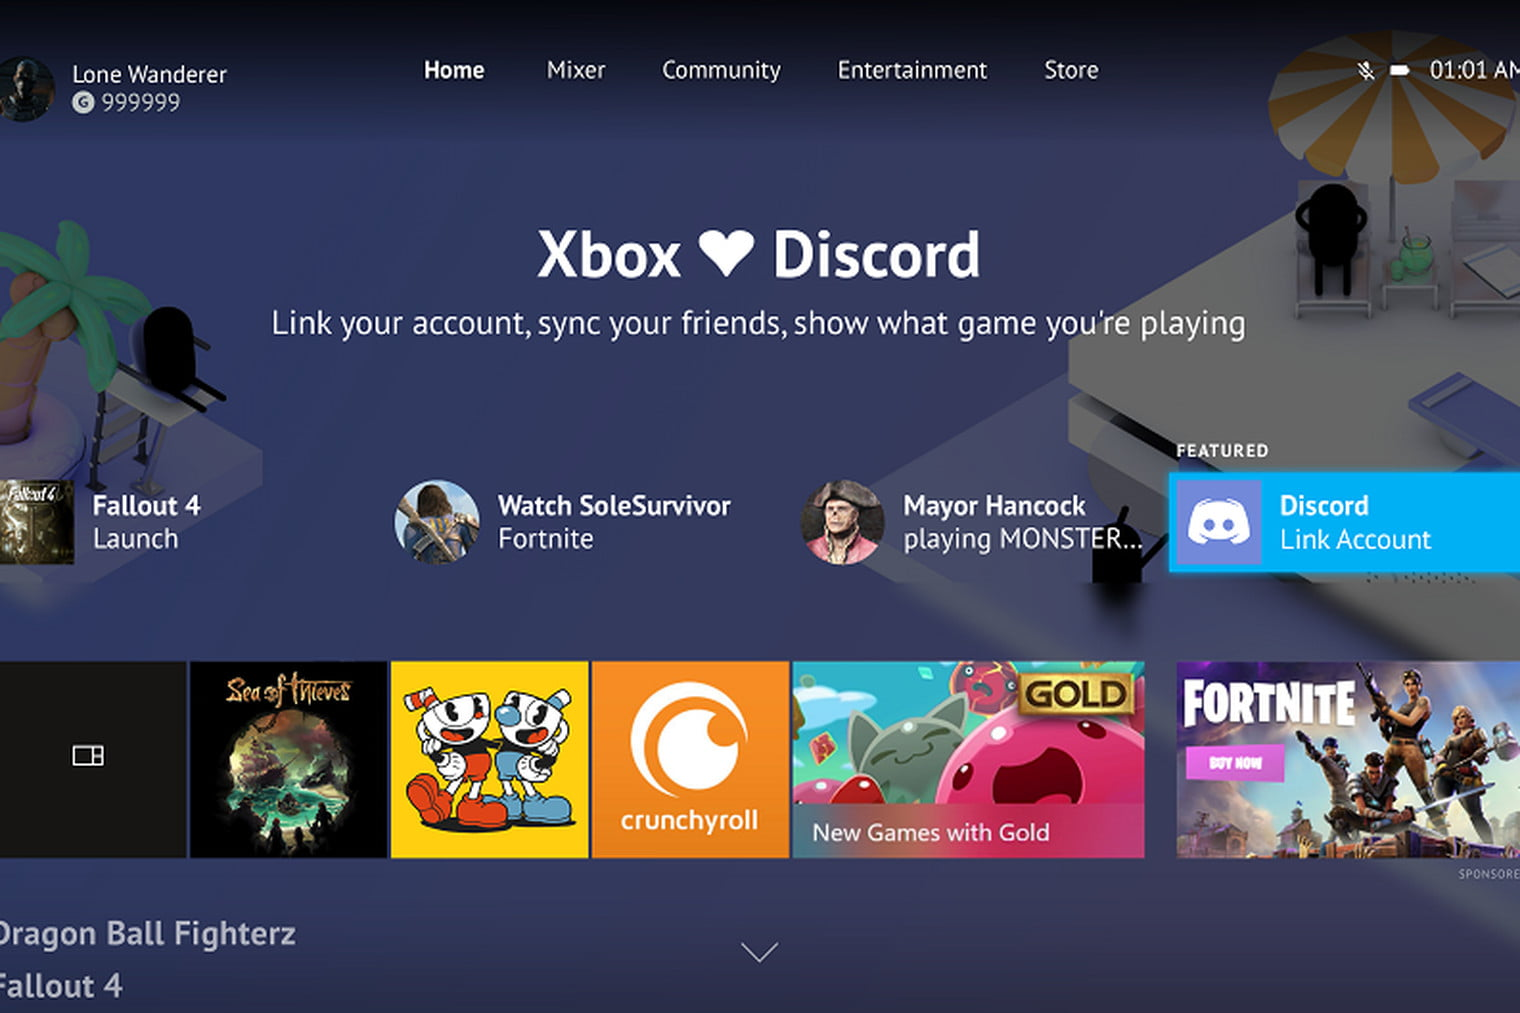 Union entre Discord y Microsoft